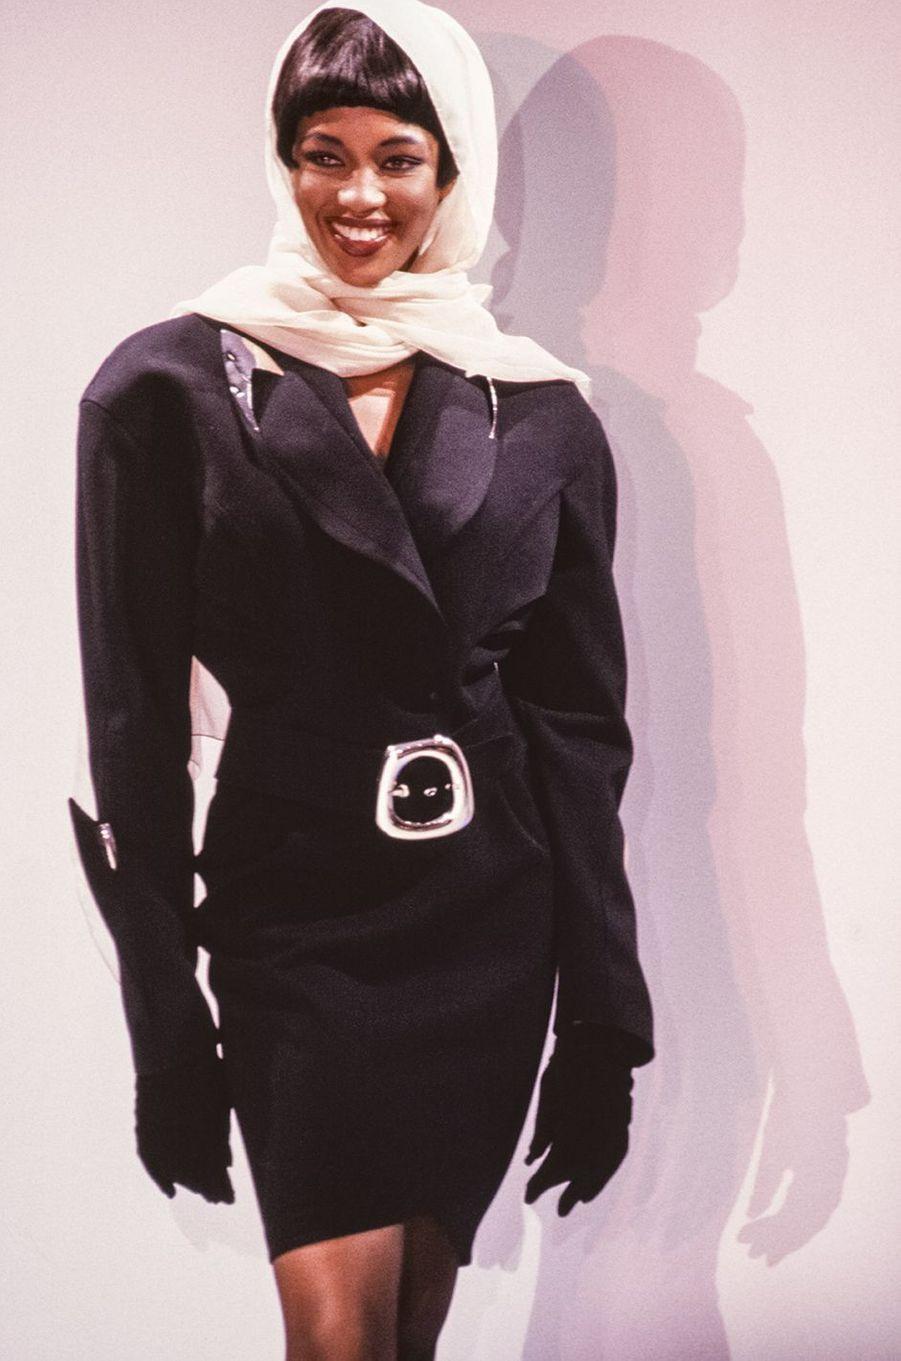 Naomi Campbell lors du défilé Thierry Mugler à Paris en mars 1989